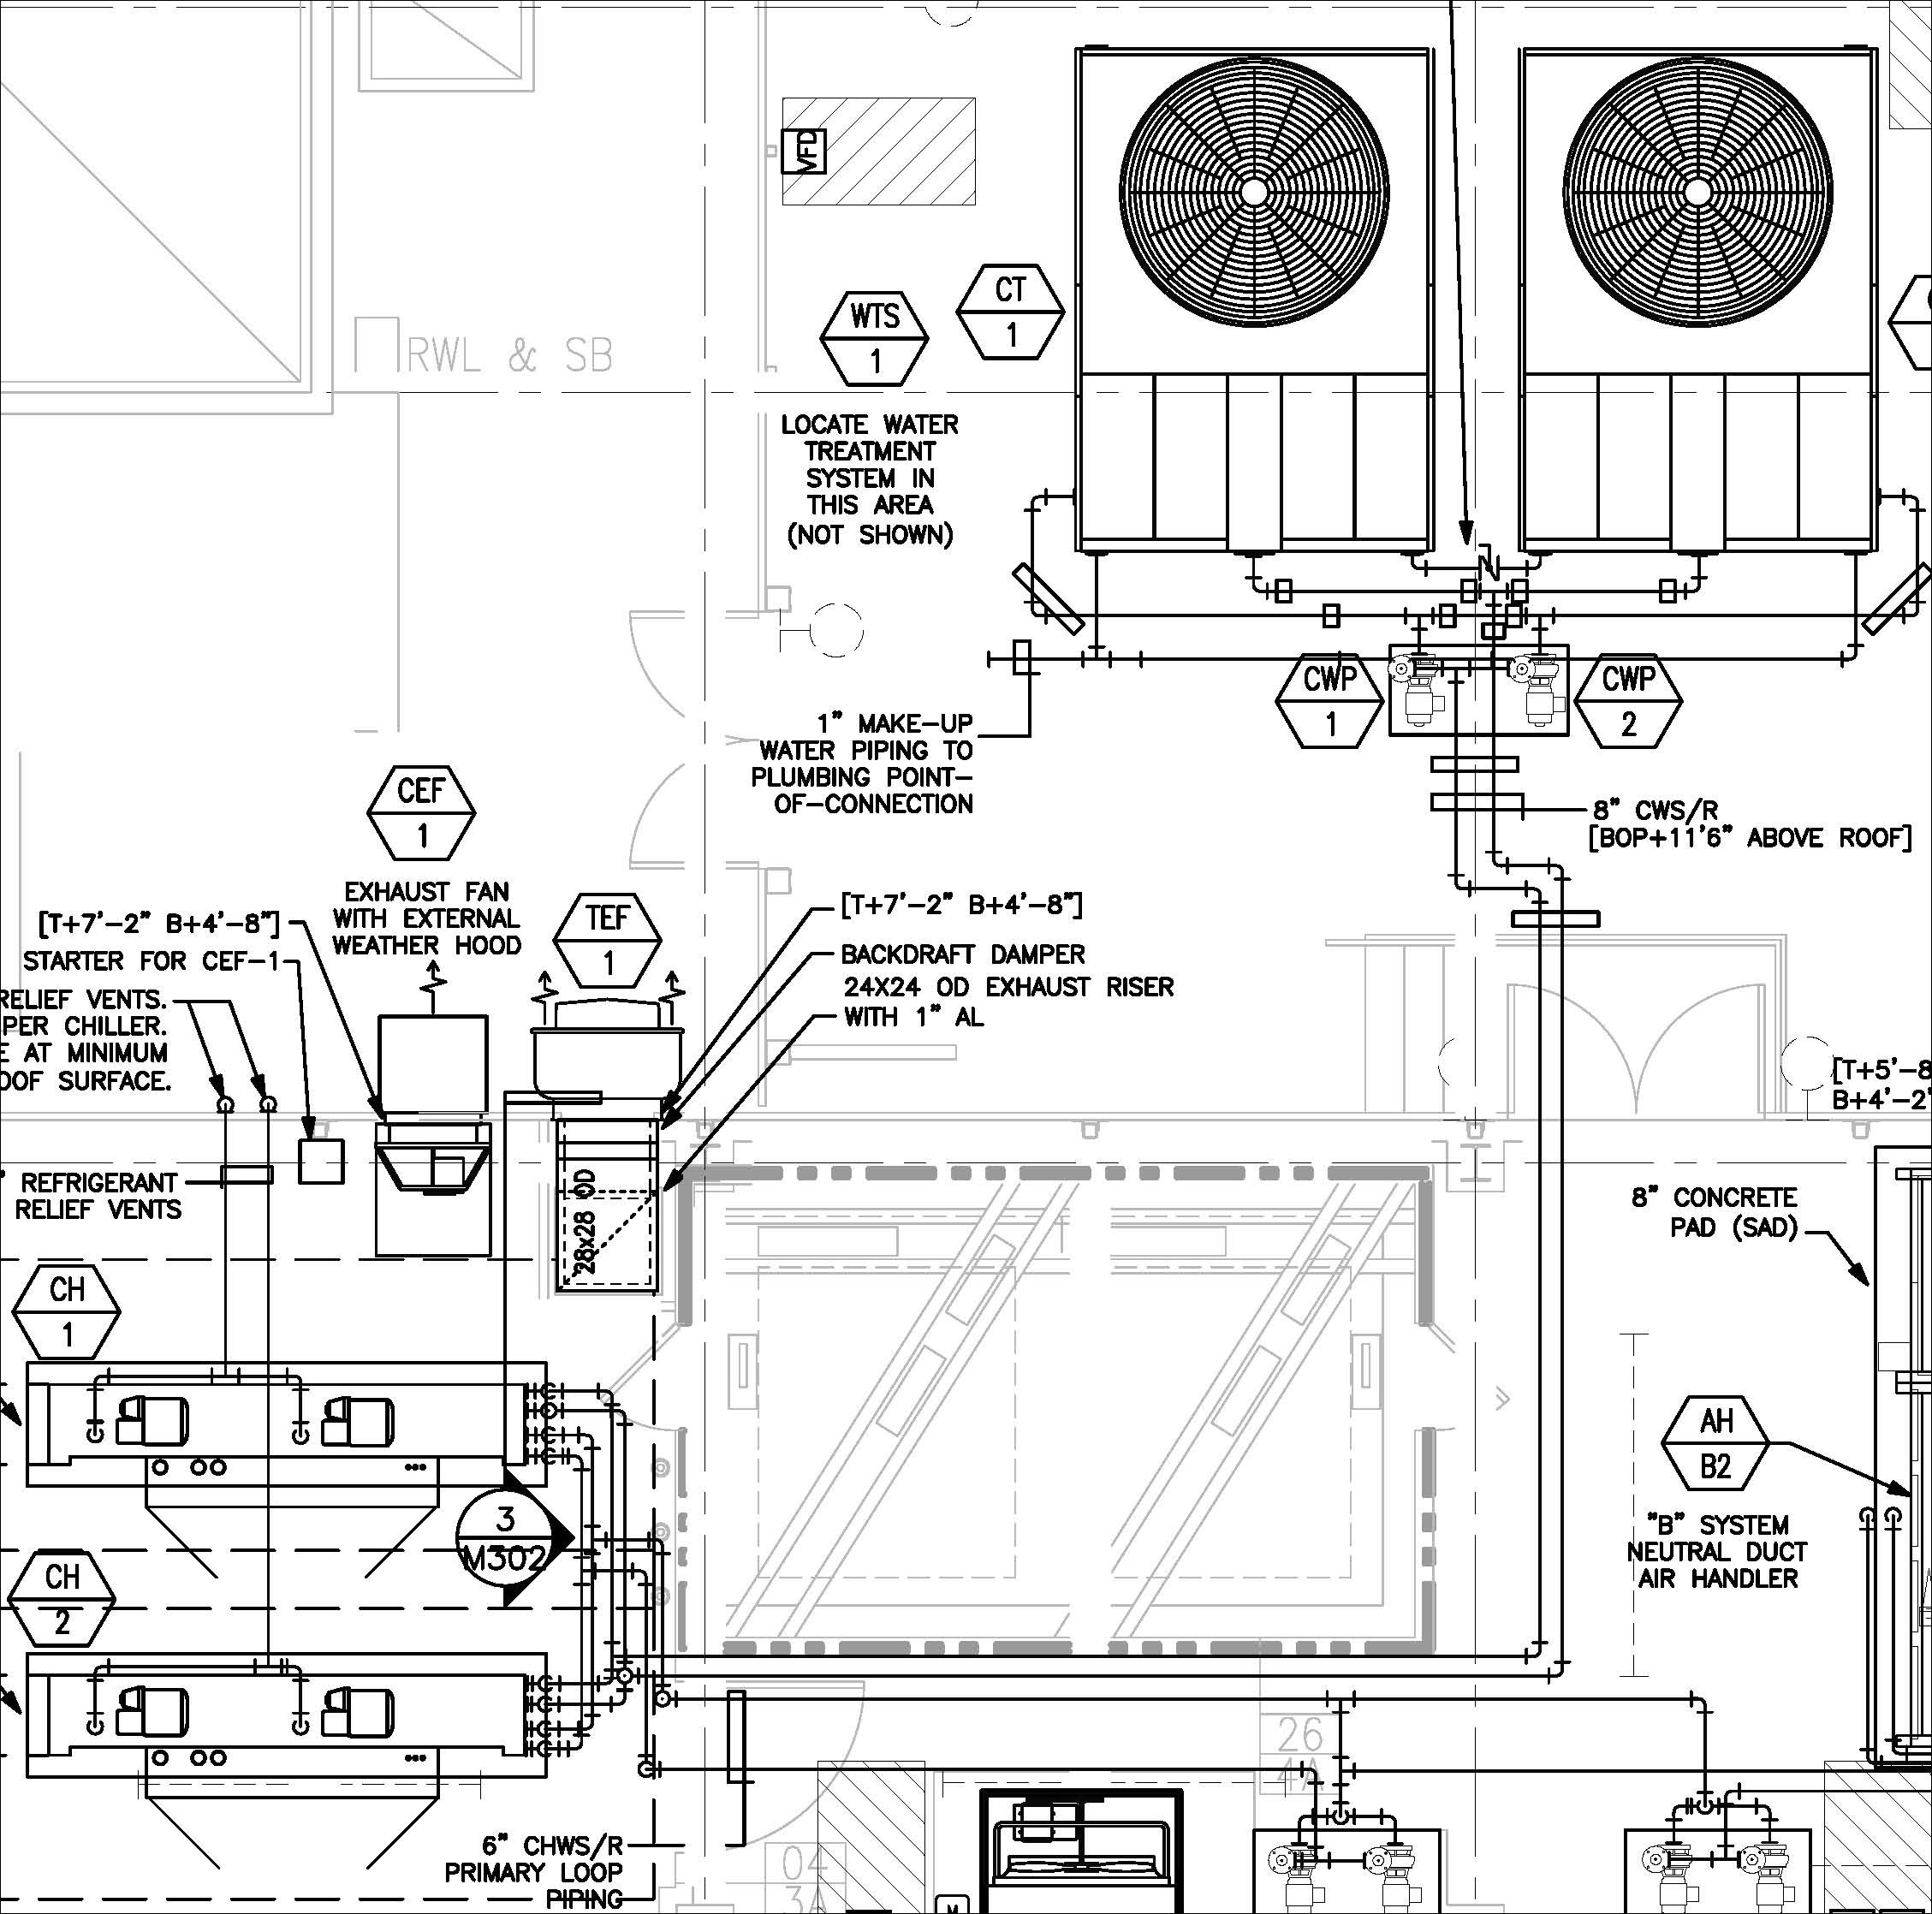 heatcraft evaporator coil wiring diagram cb 5970  bohn let0901f wiring diagram free diagram  cb 5970  bohn let0901f wiring diagram